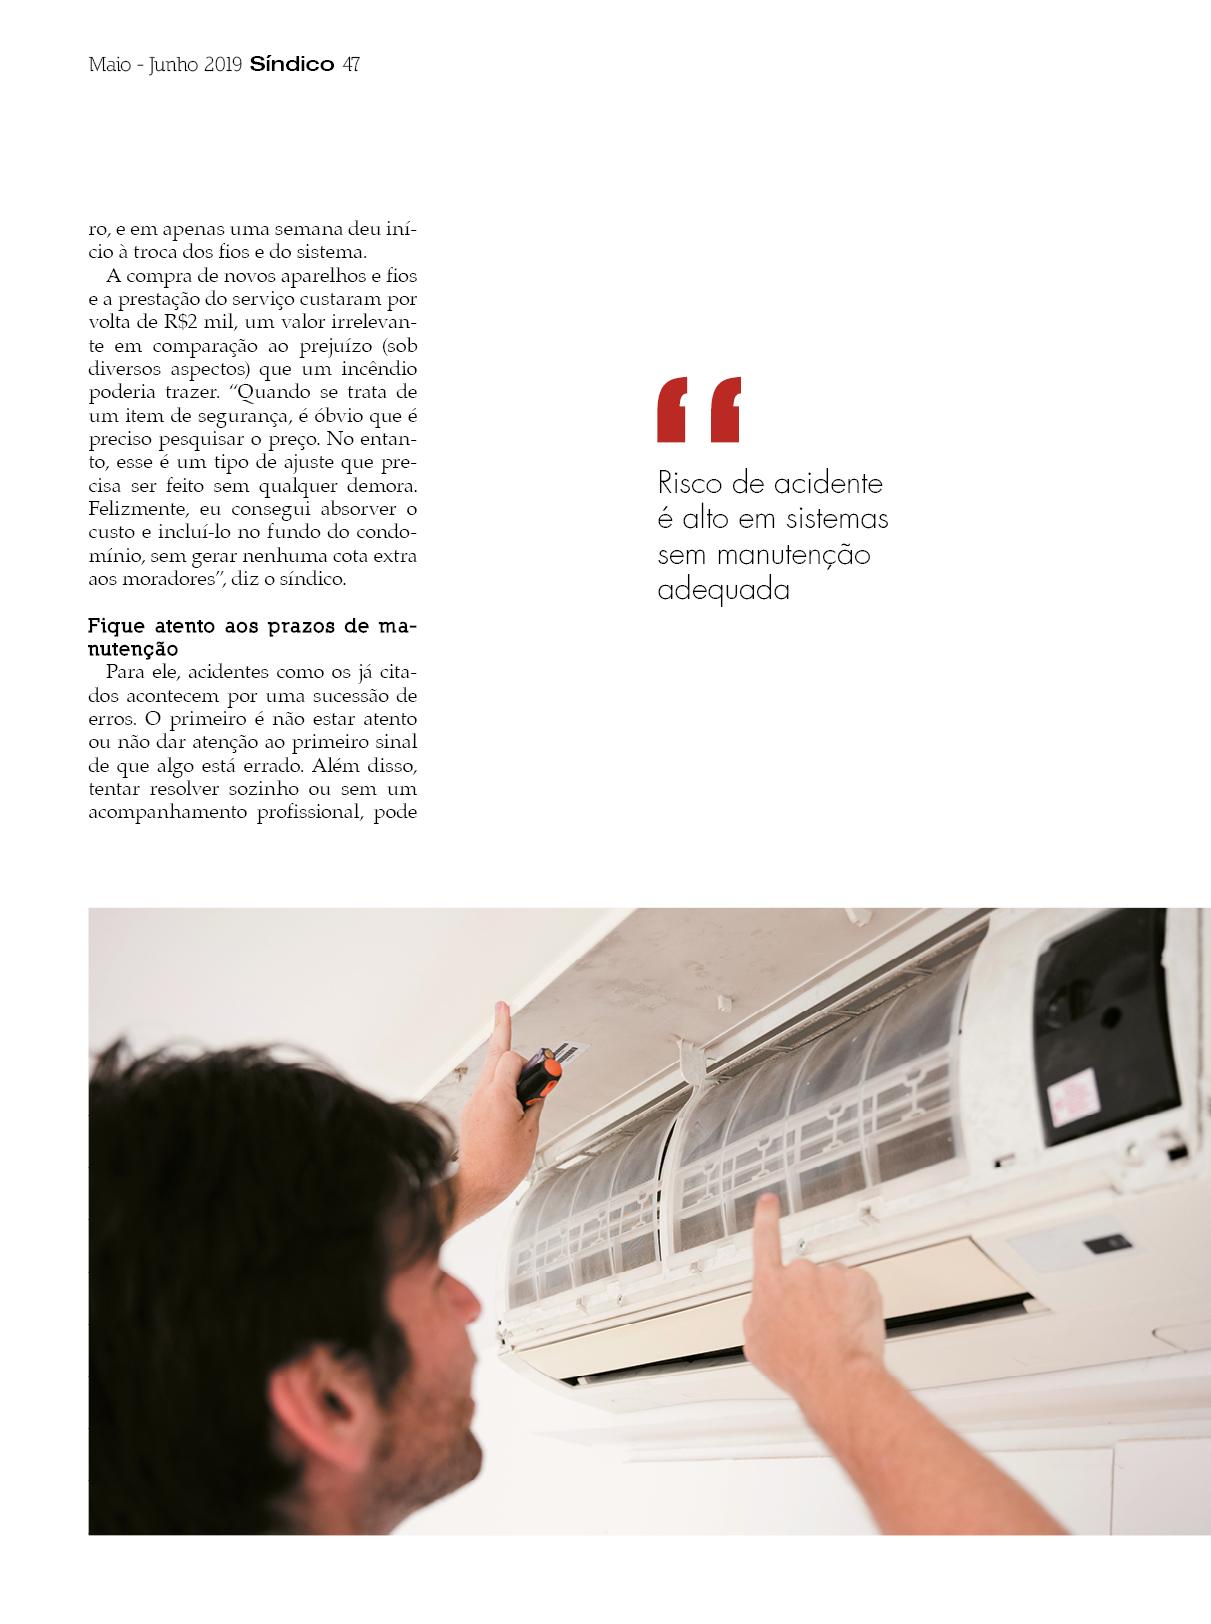 Revista Síndico_ed24445